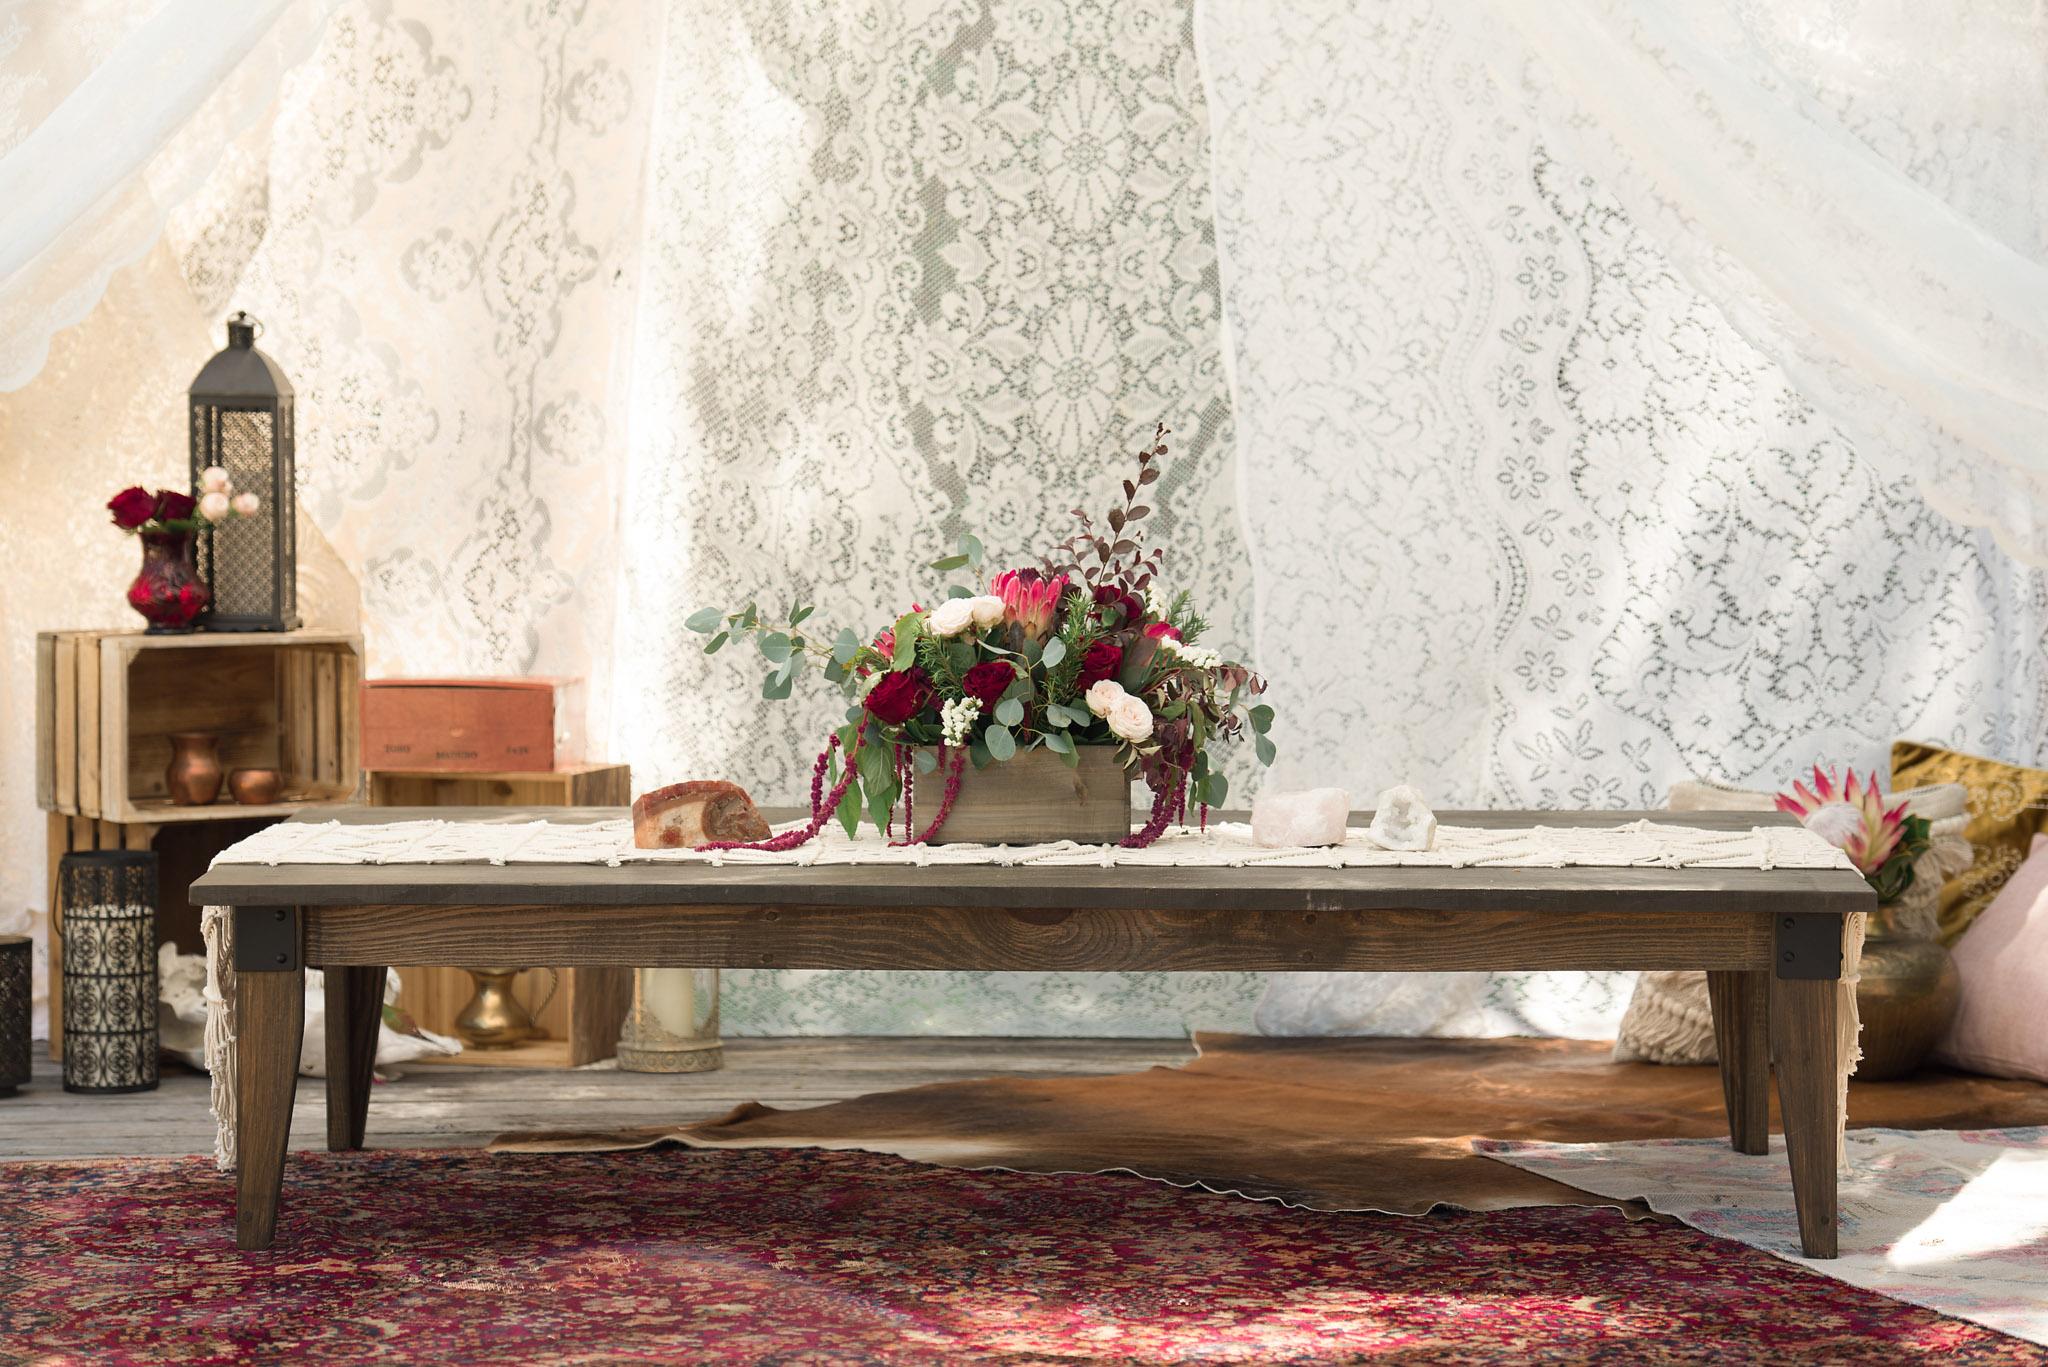 Tampa Boho low table rentals